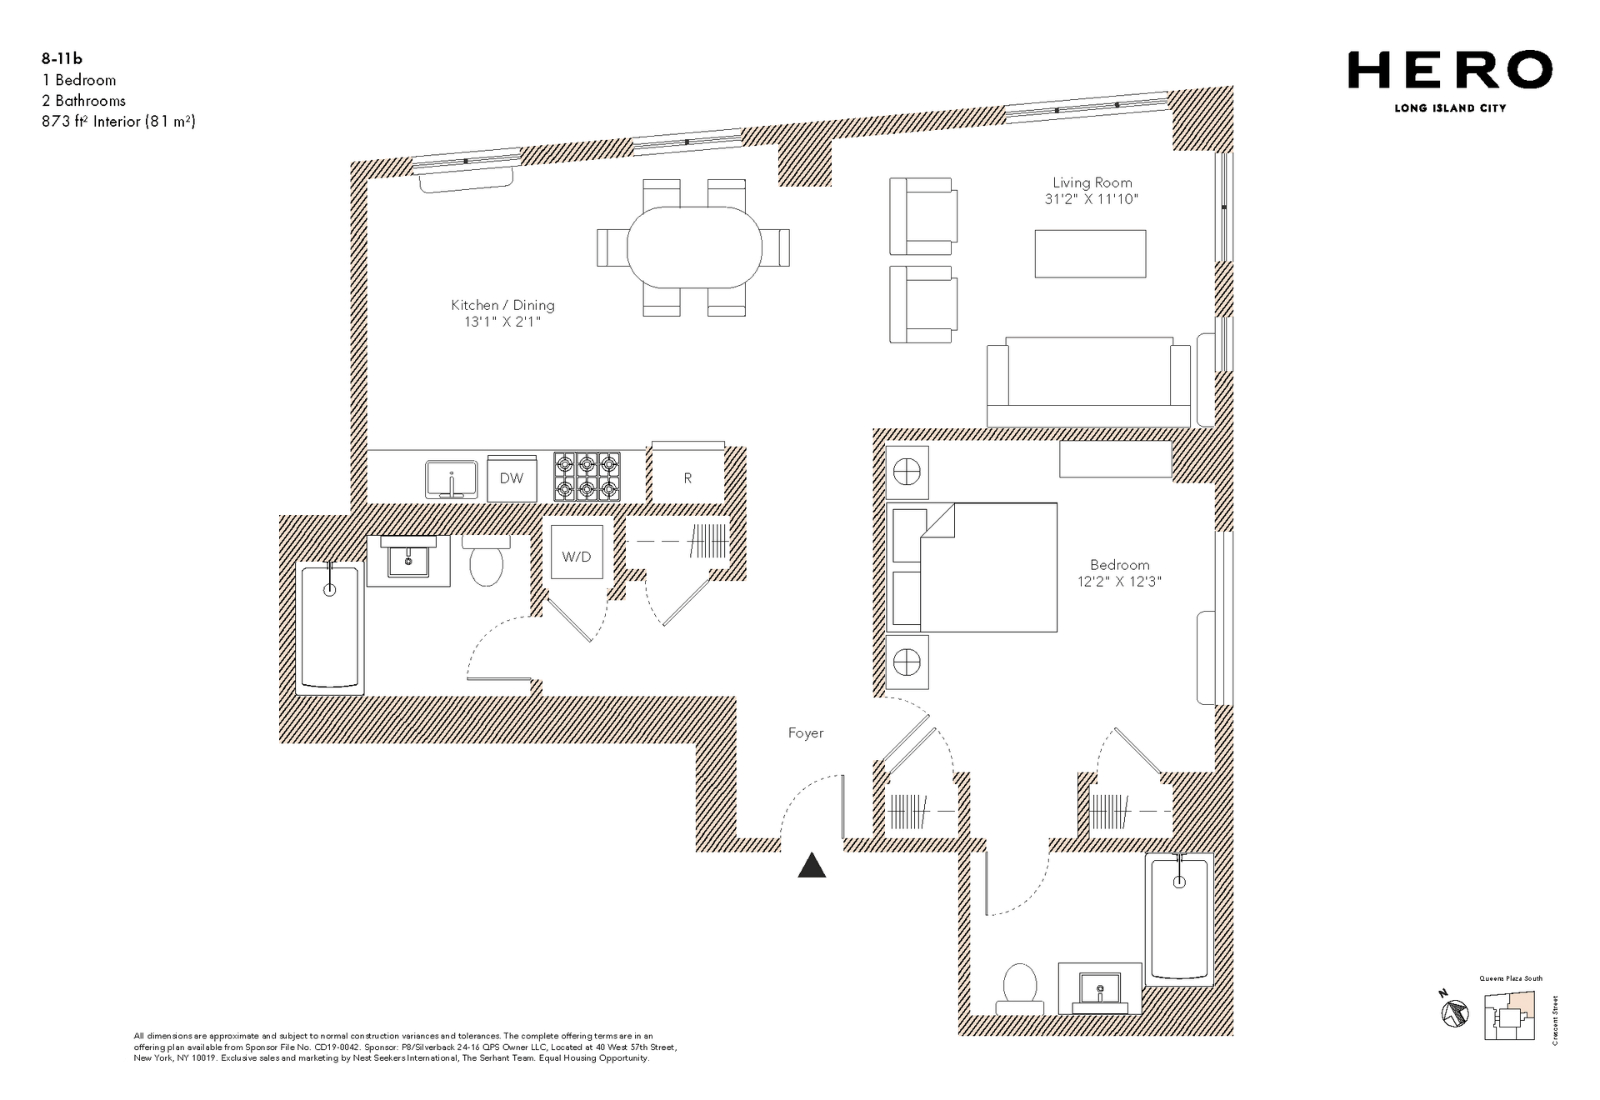 B Line: 一房一厅户型,此户型很容易改为两房